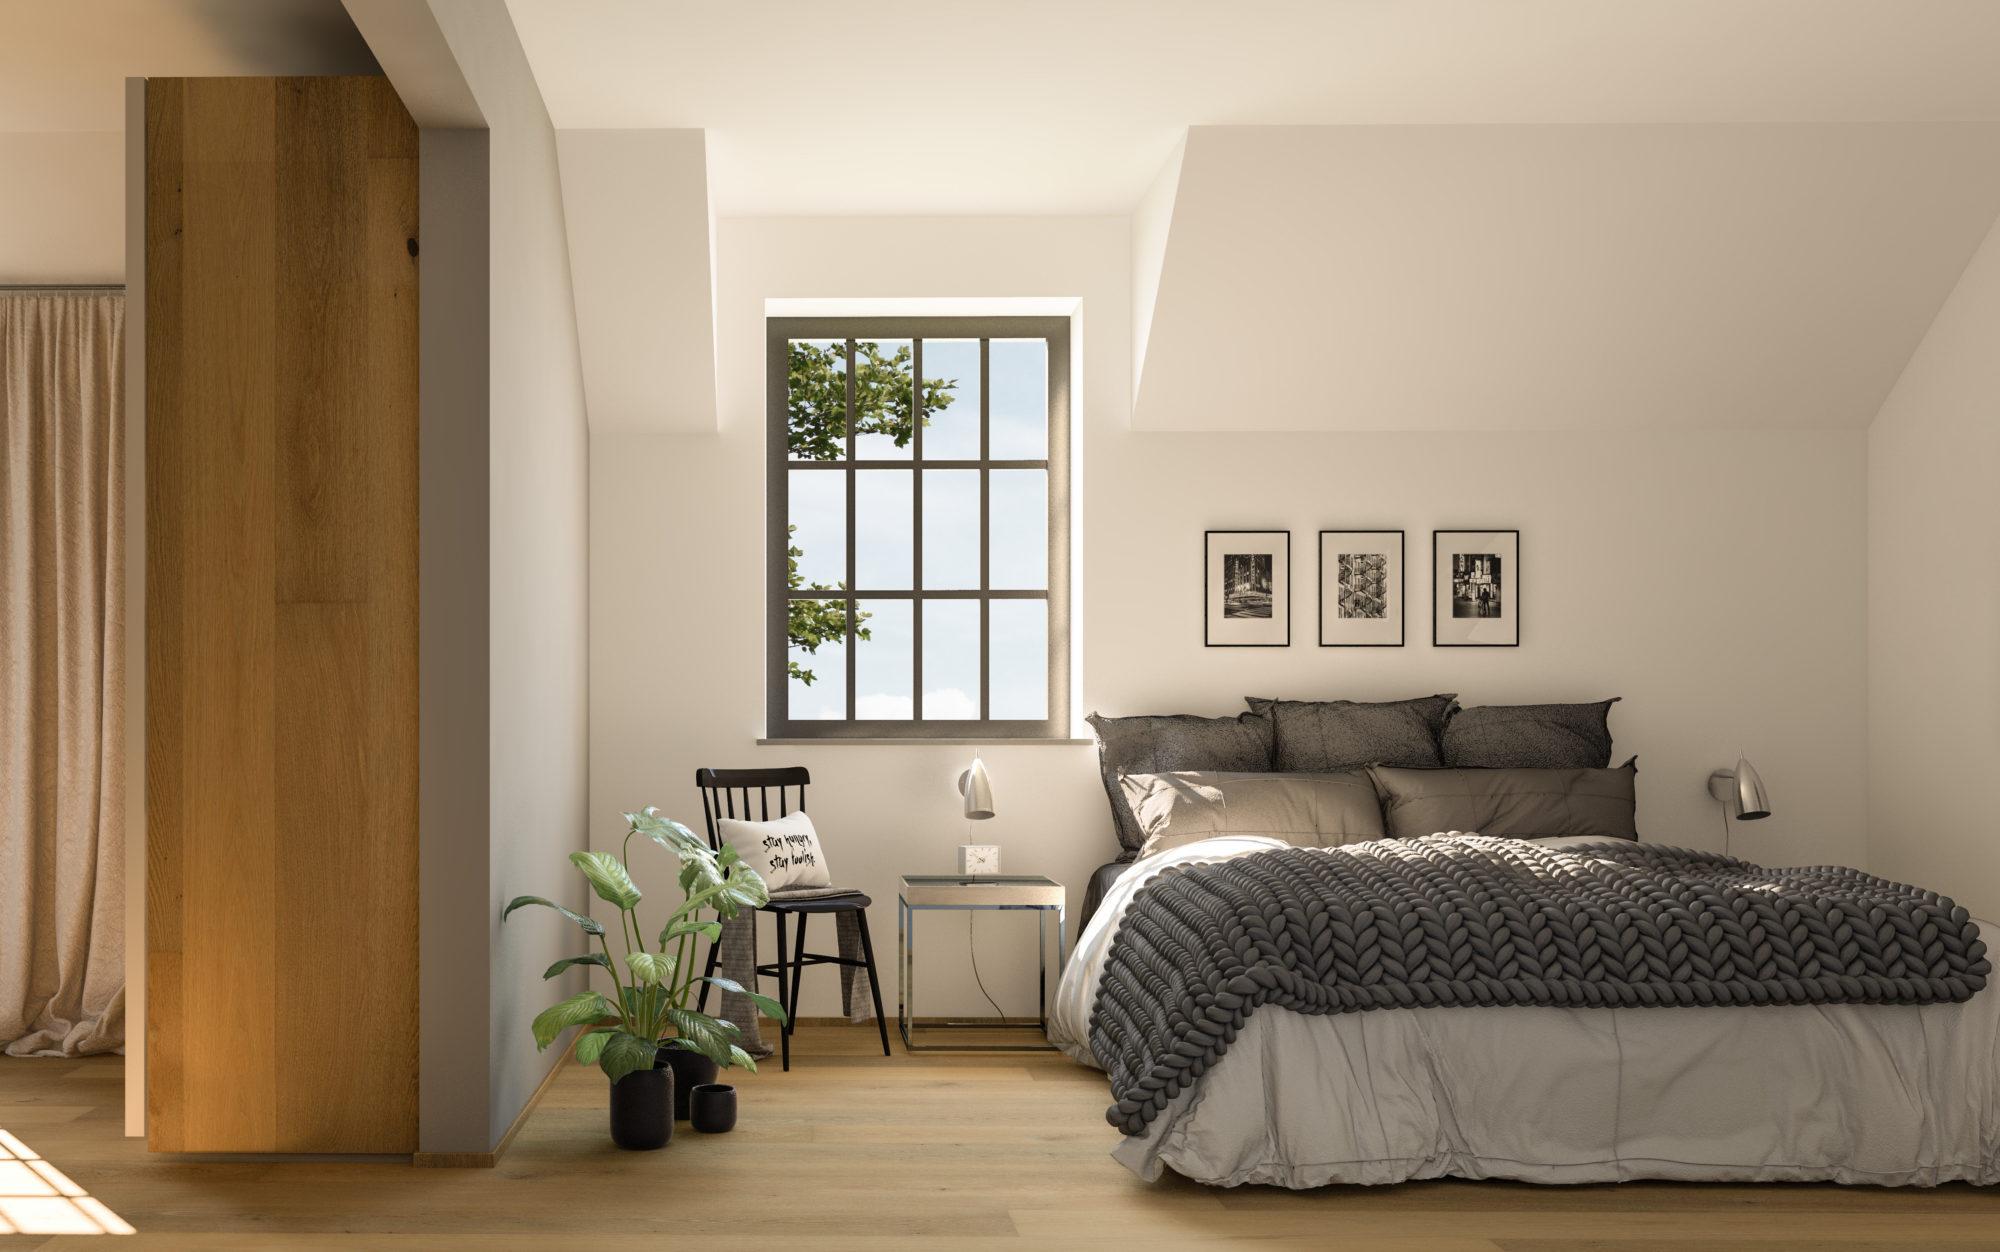 Interieur slaapkamer